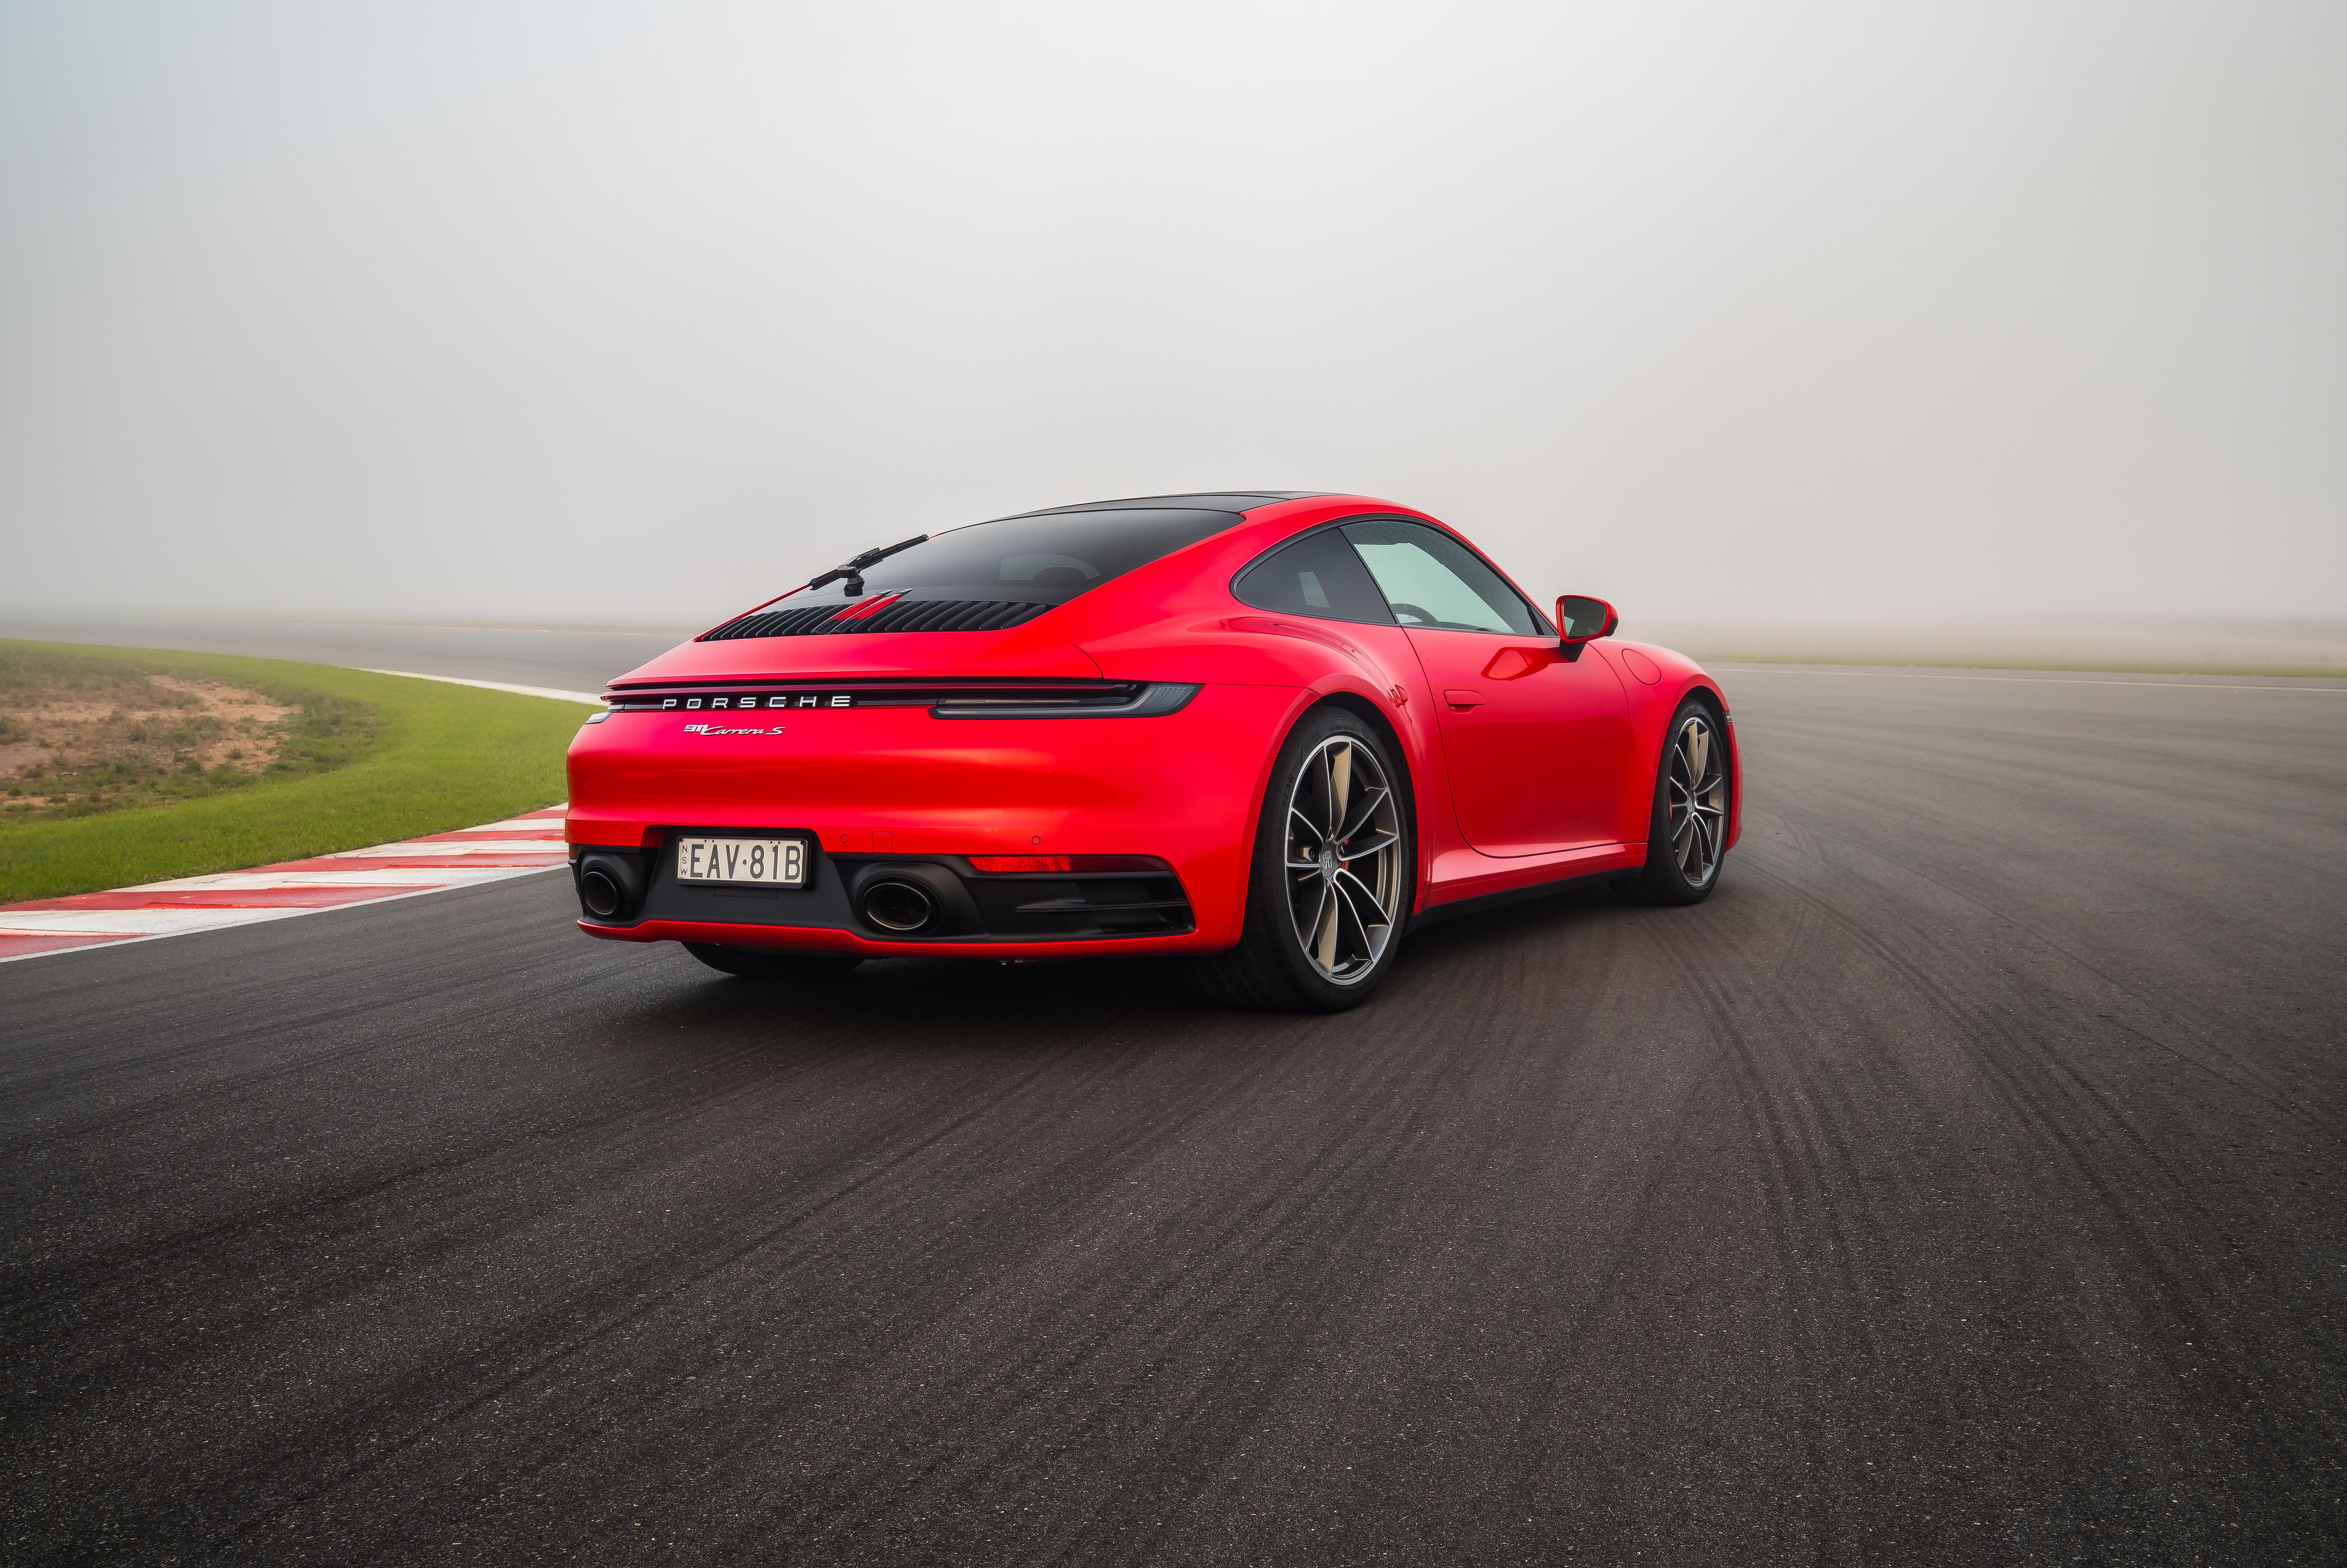 2019 Porsche 911 Carrera 8k, HD Cars, 4k Wallpapers, Images